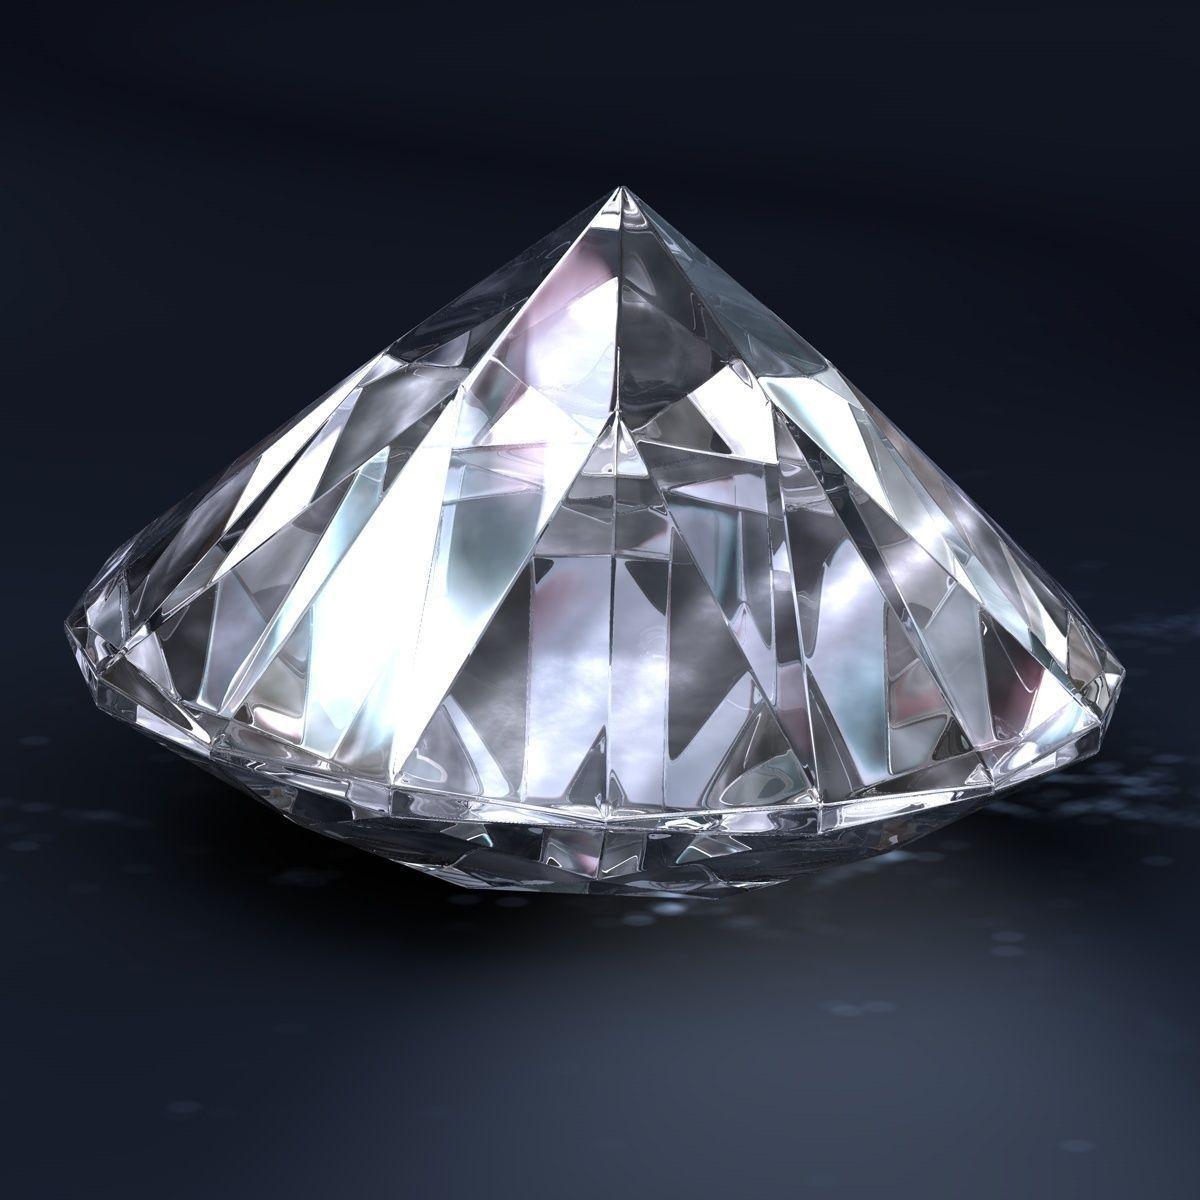 Cinema 4d Diamonds - 0425